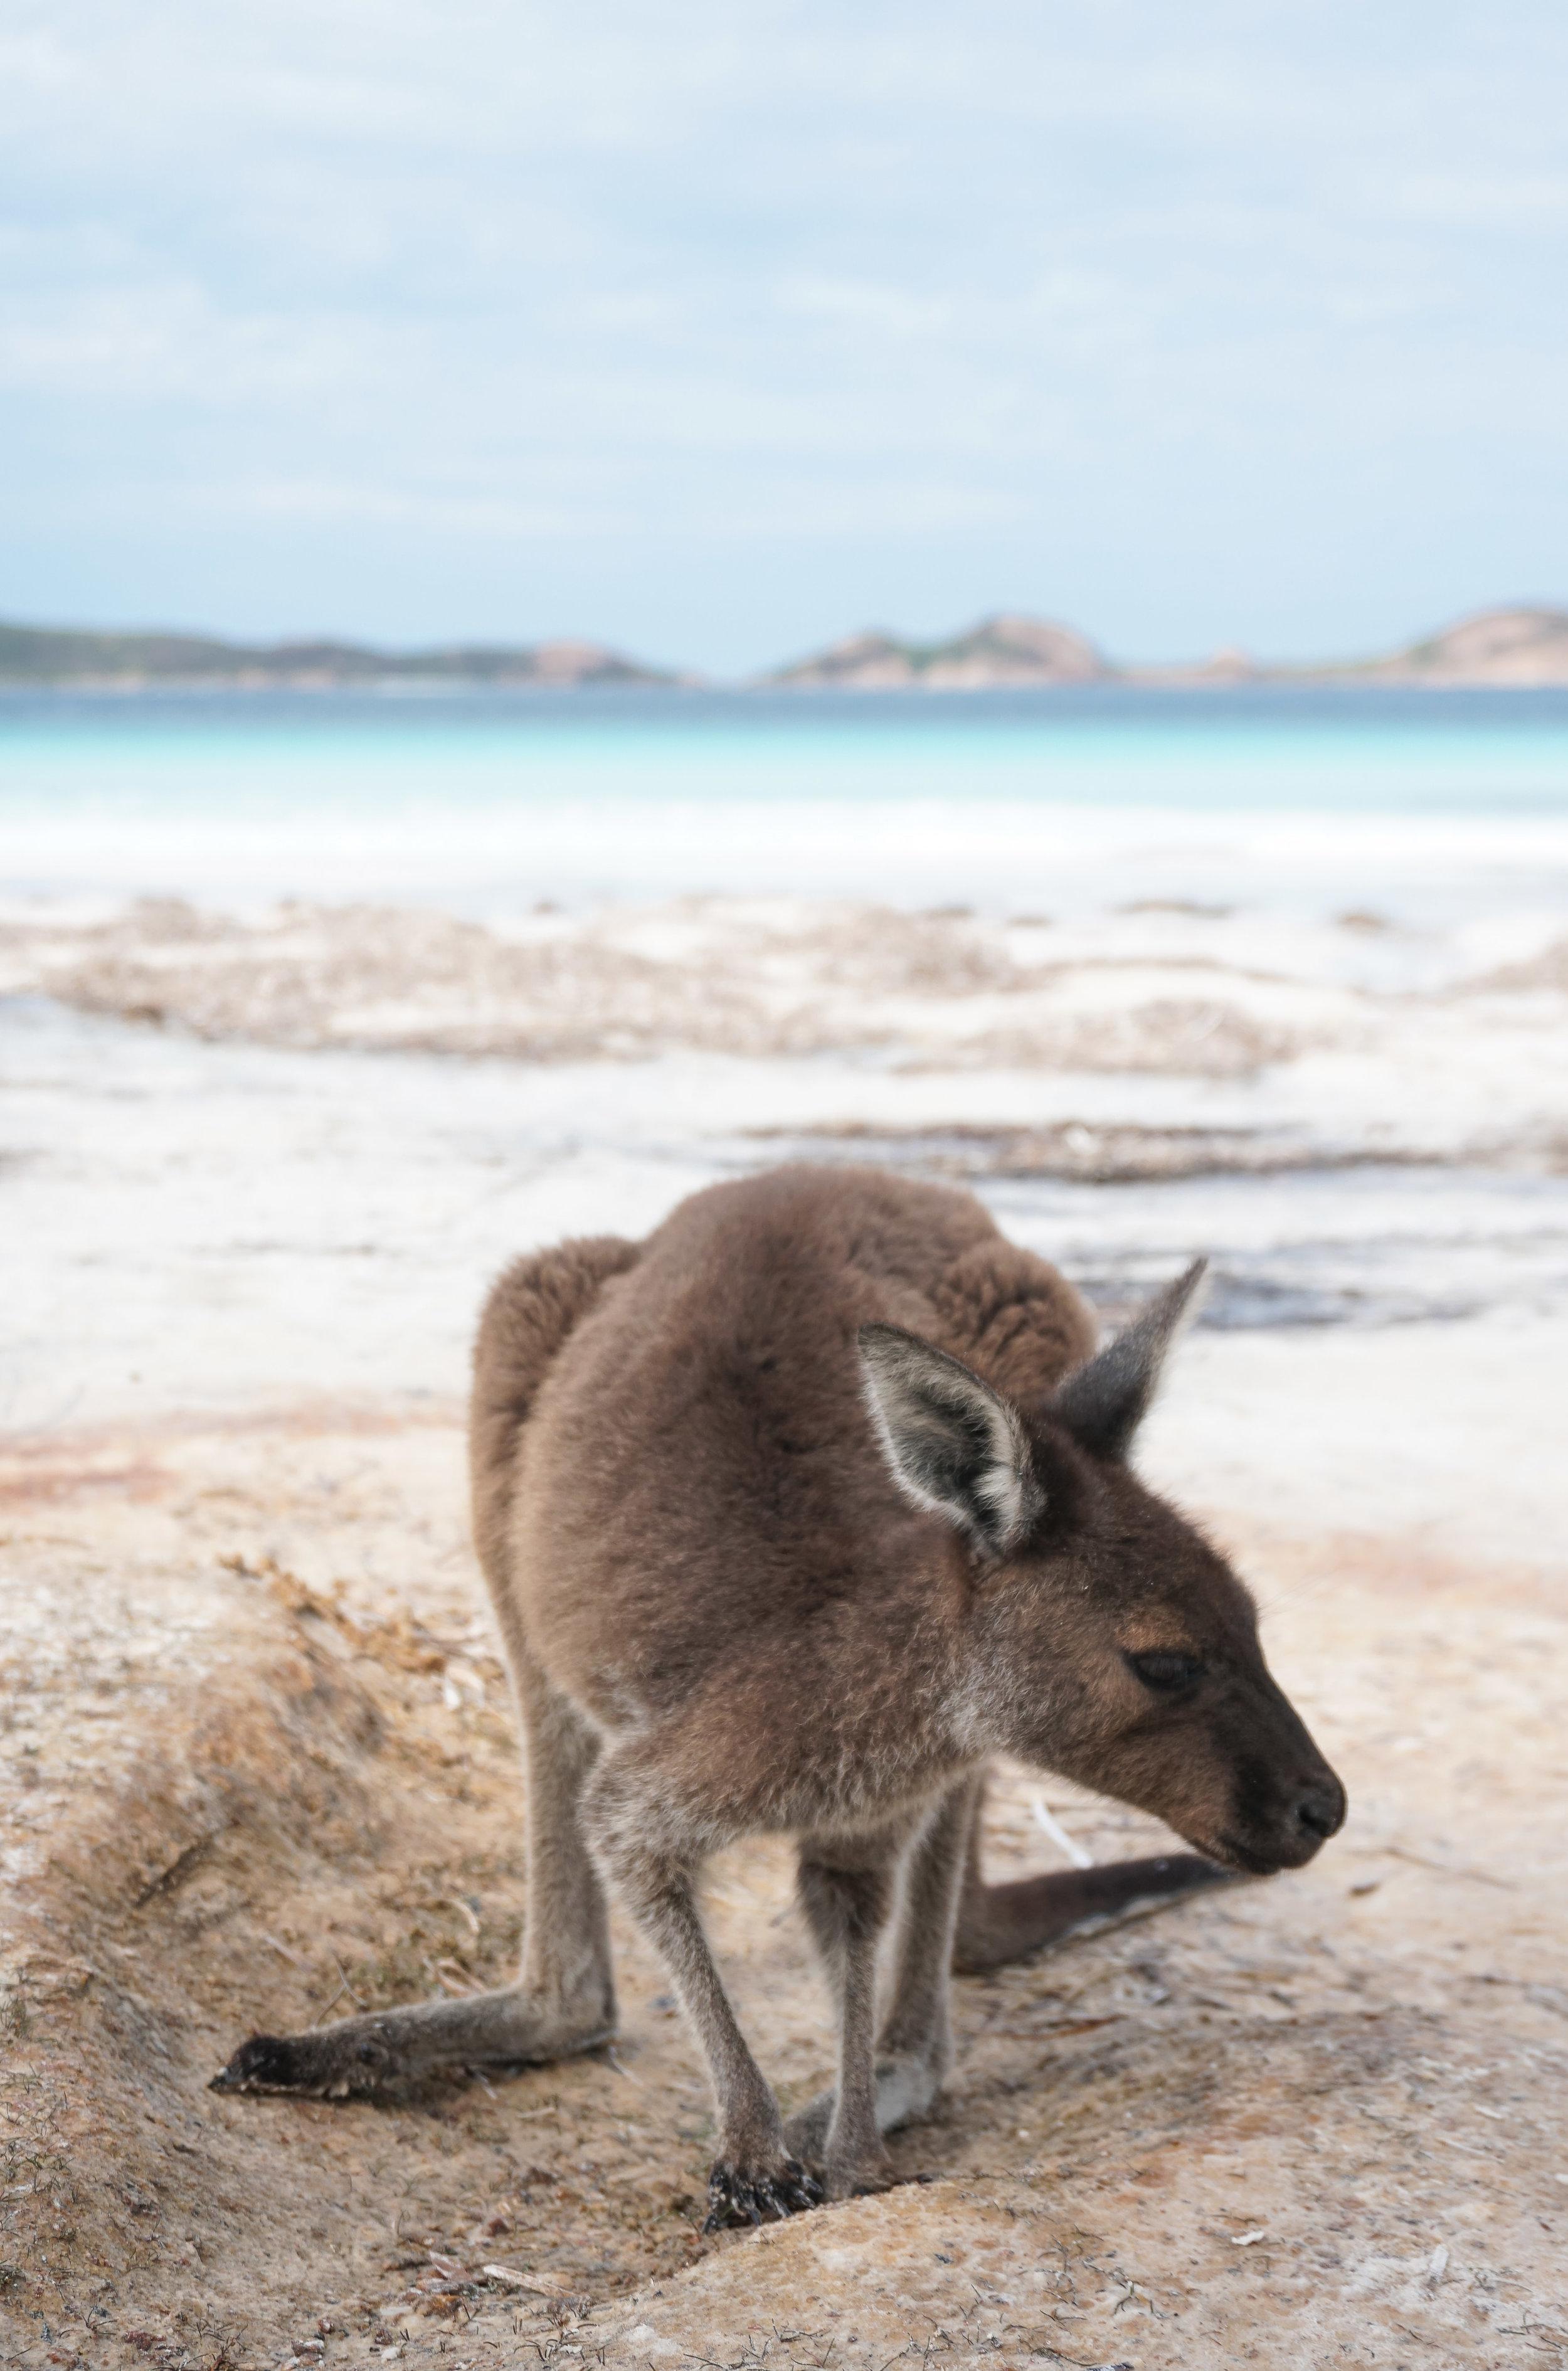 curio.trips.australia.wa.kangaroo.beach.portrait.jpg